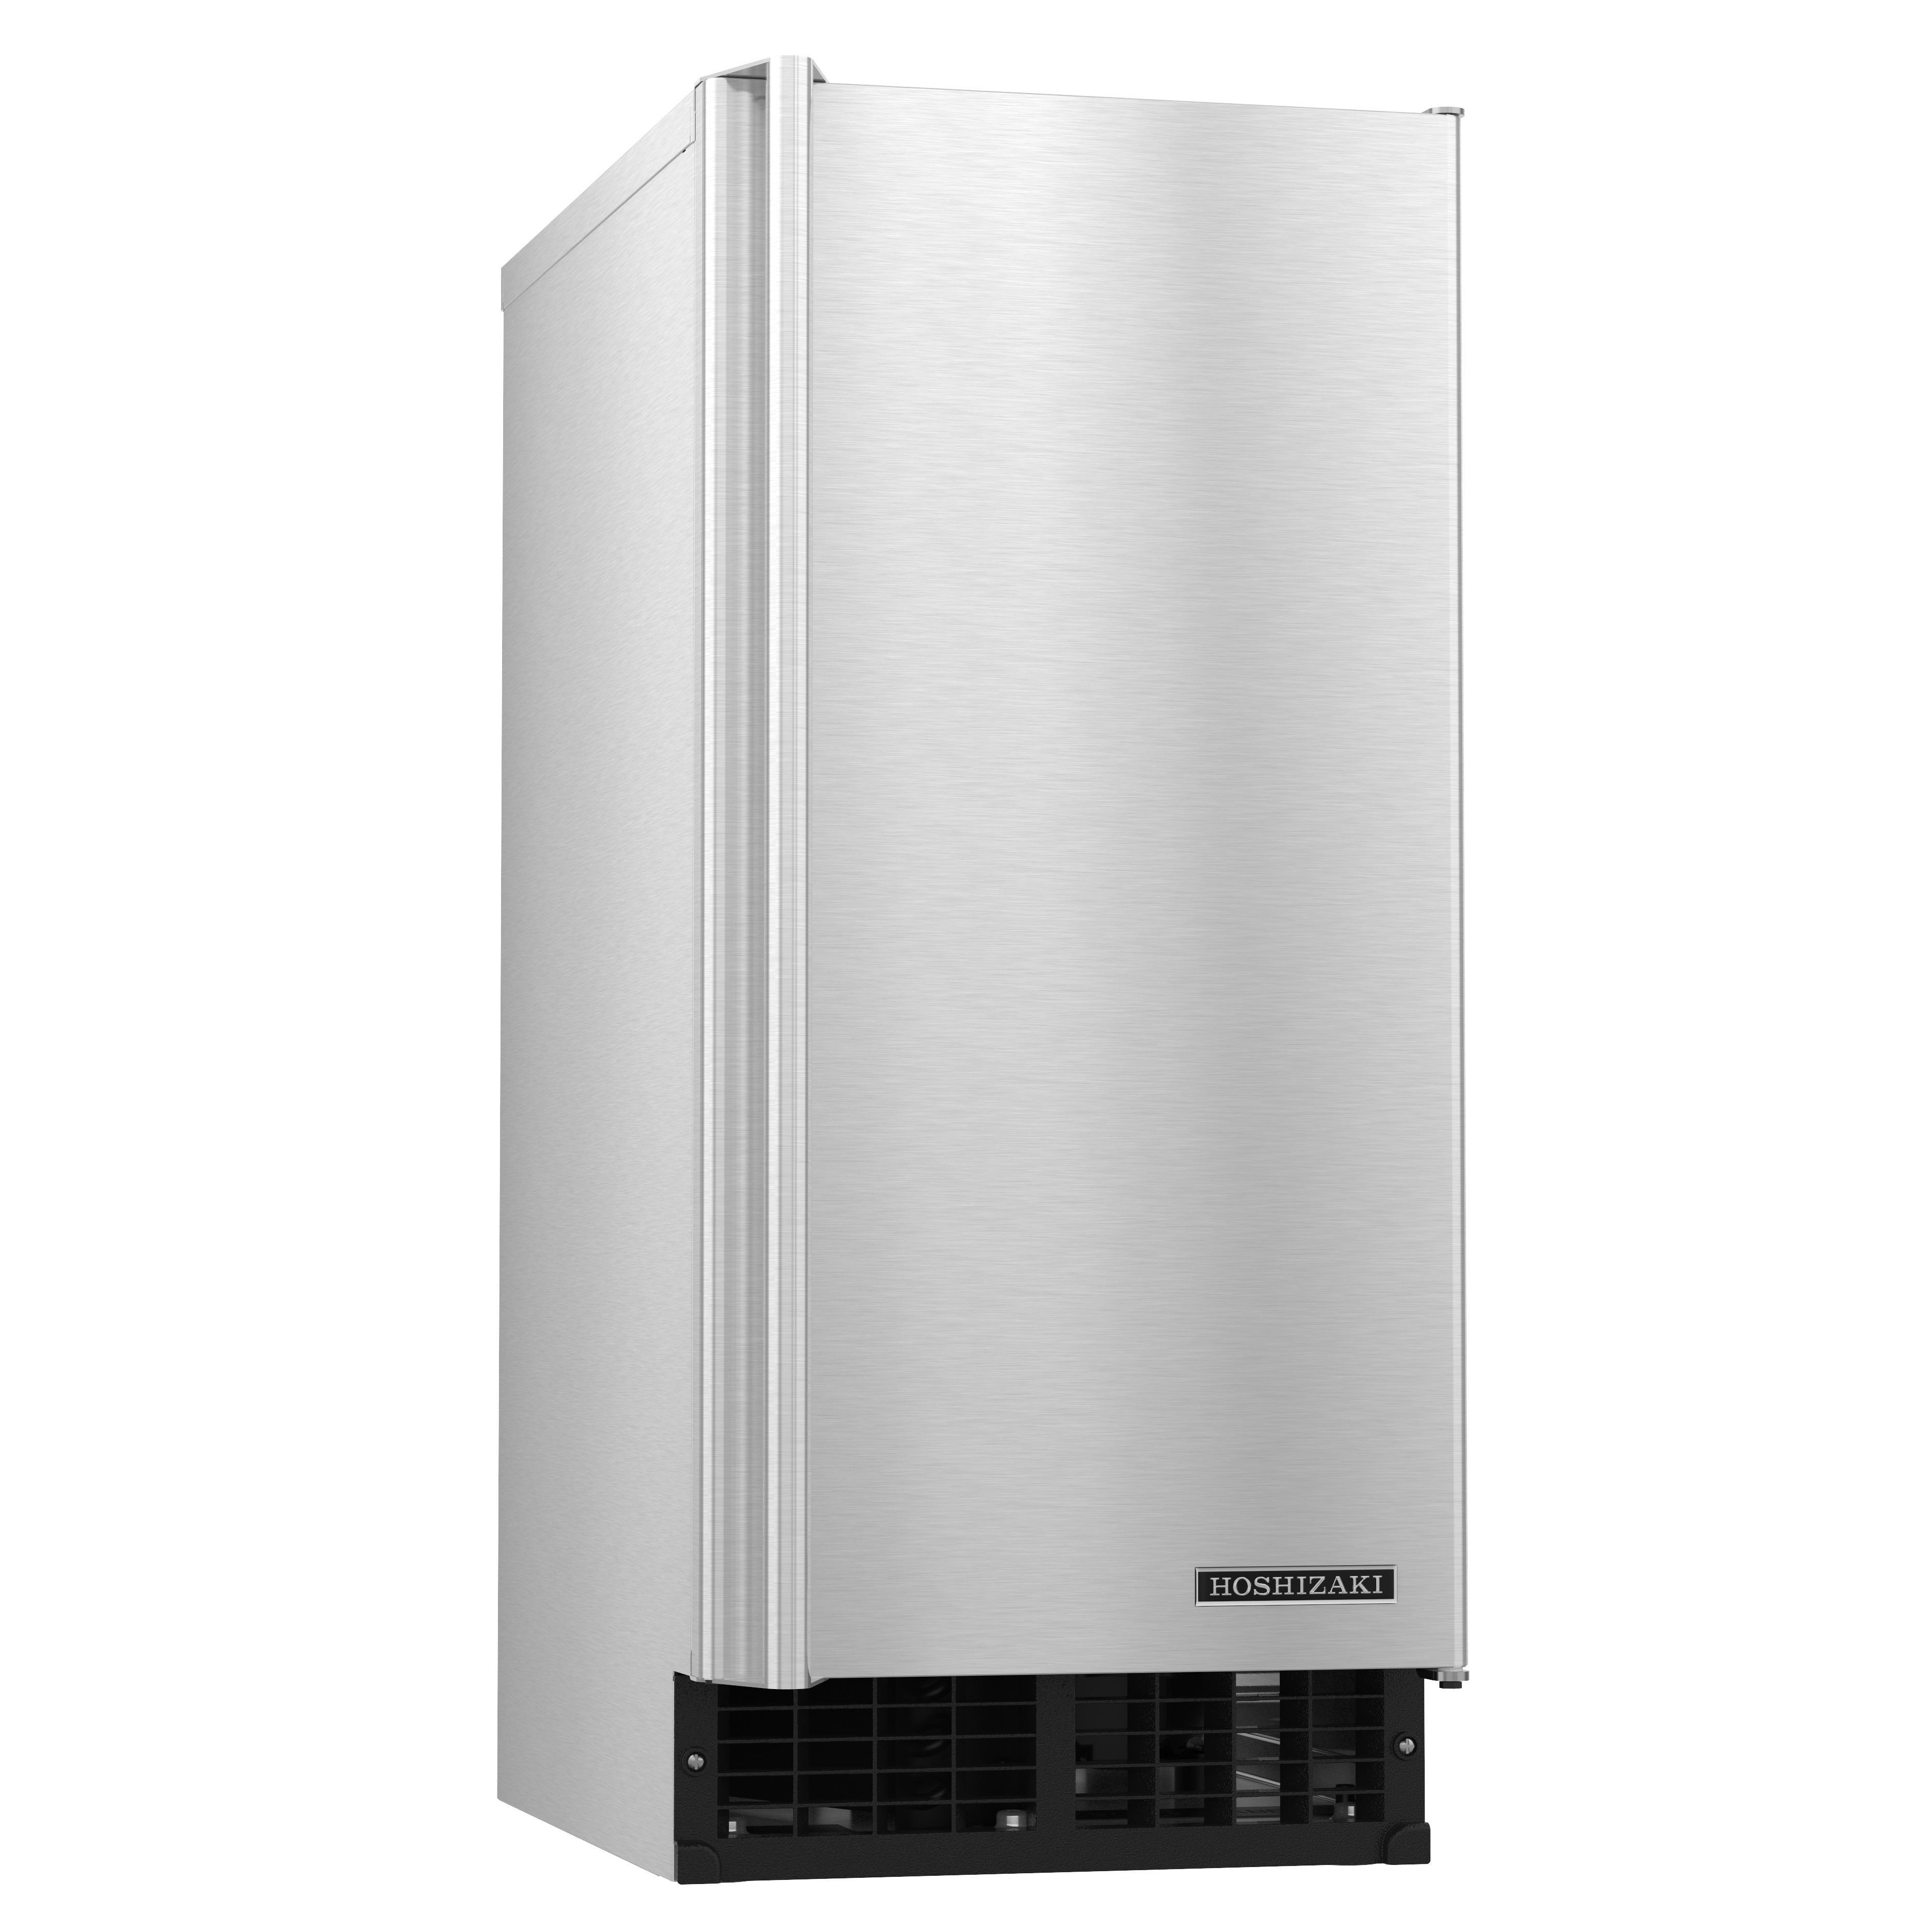 AM-50BAJ Hoshizaki ice cubers, ice storage & ice dispensers